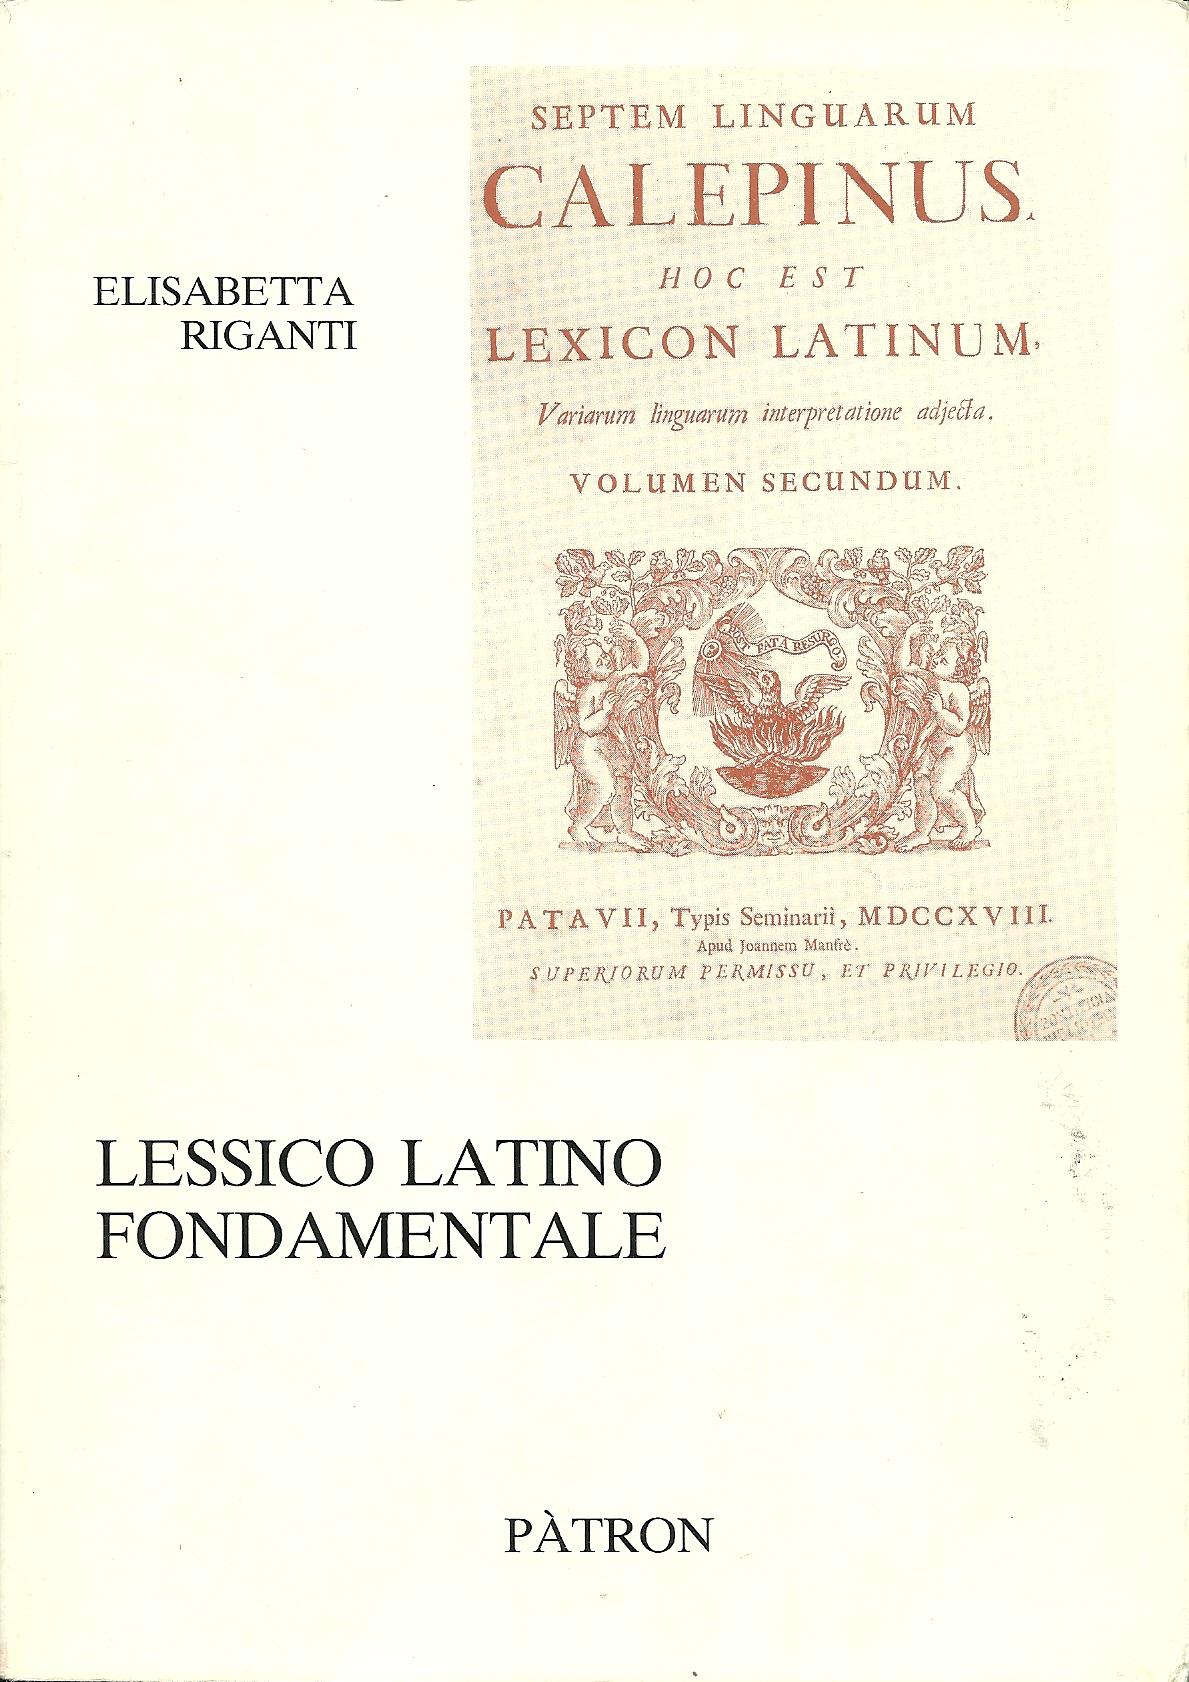 Lessico latino fondamentale